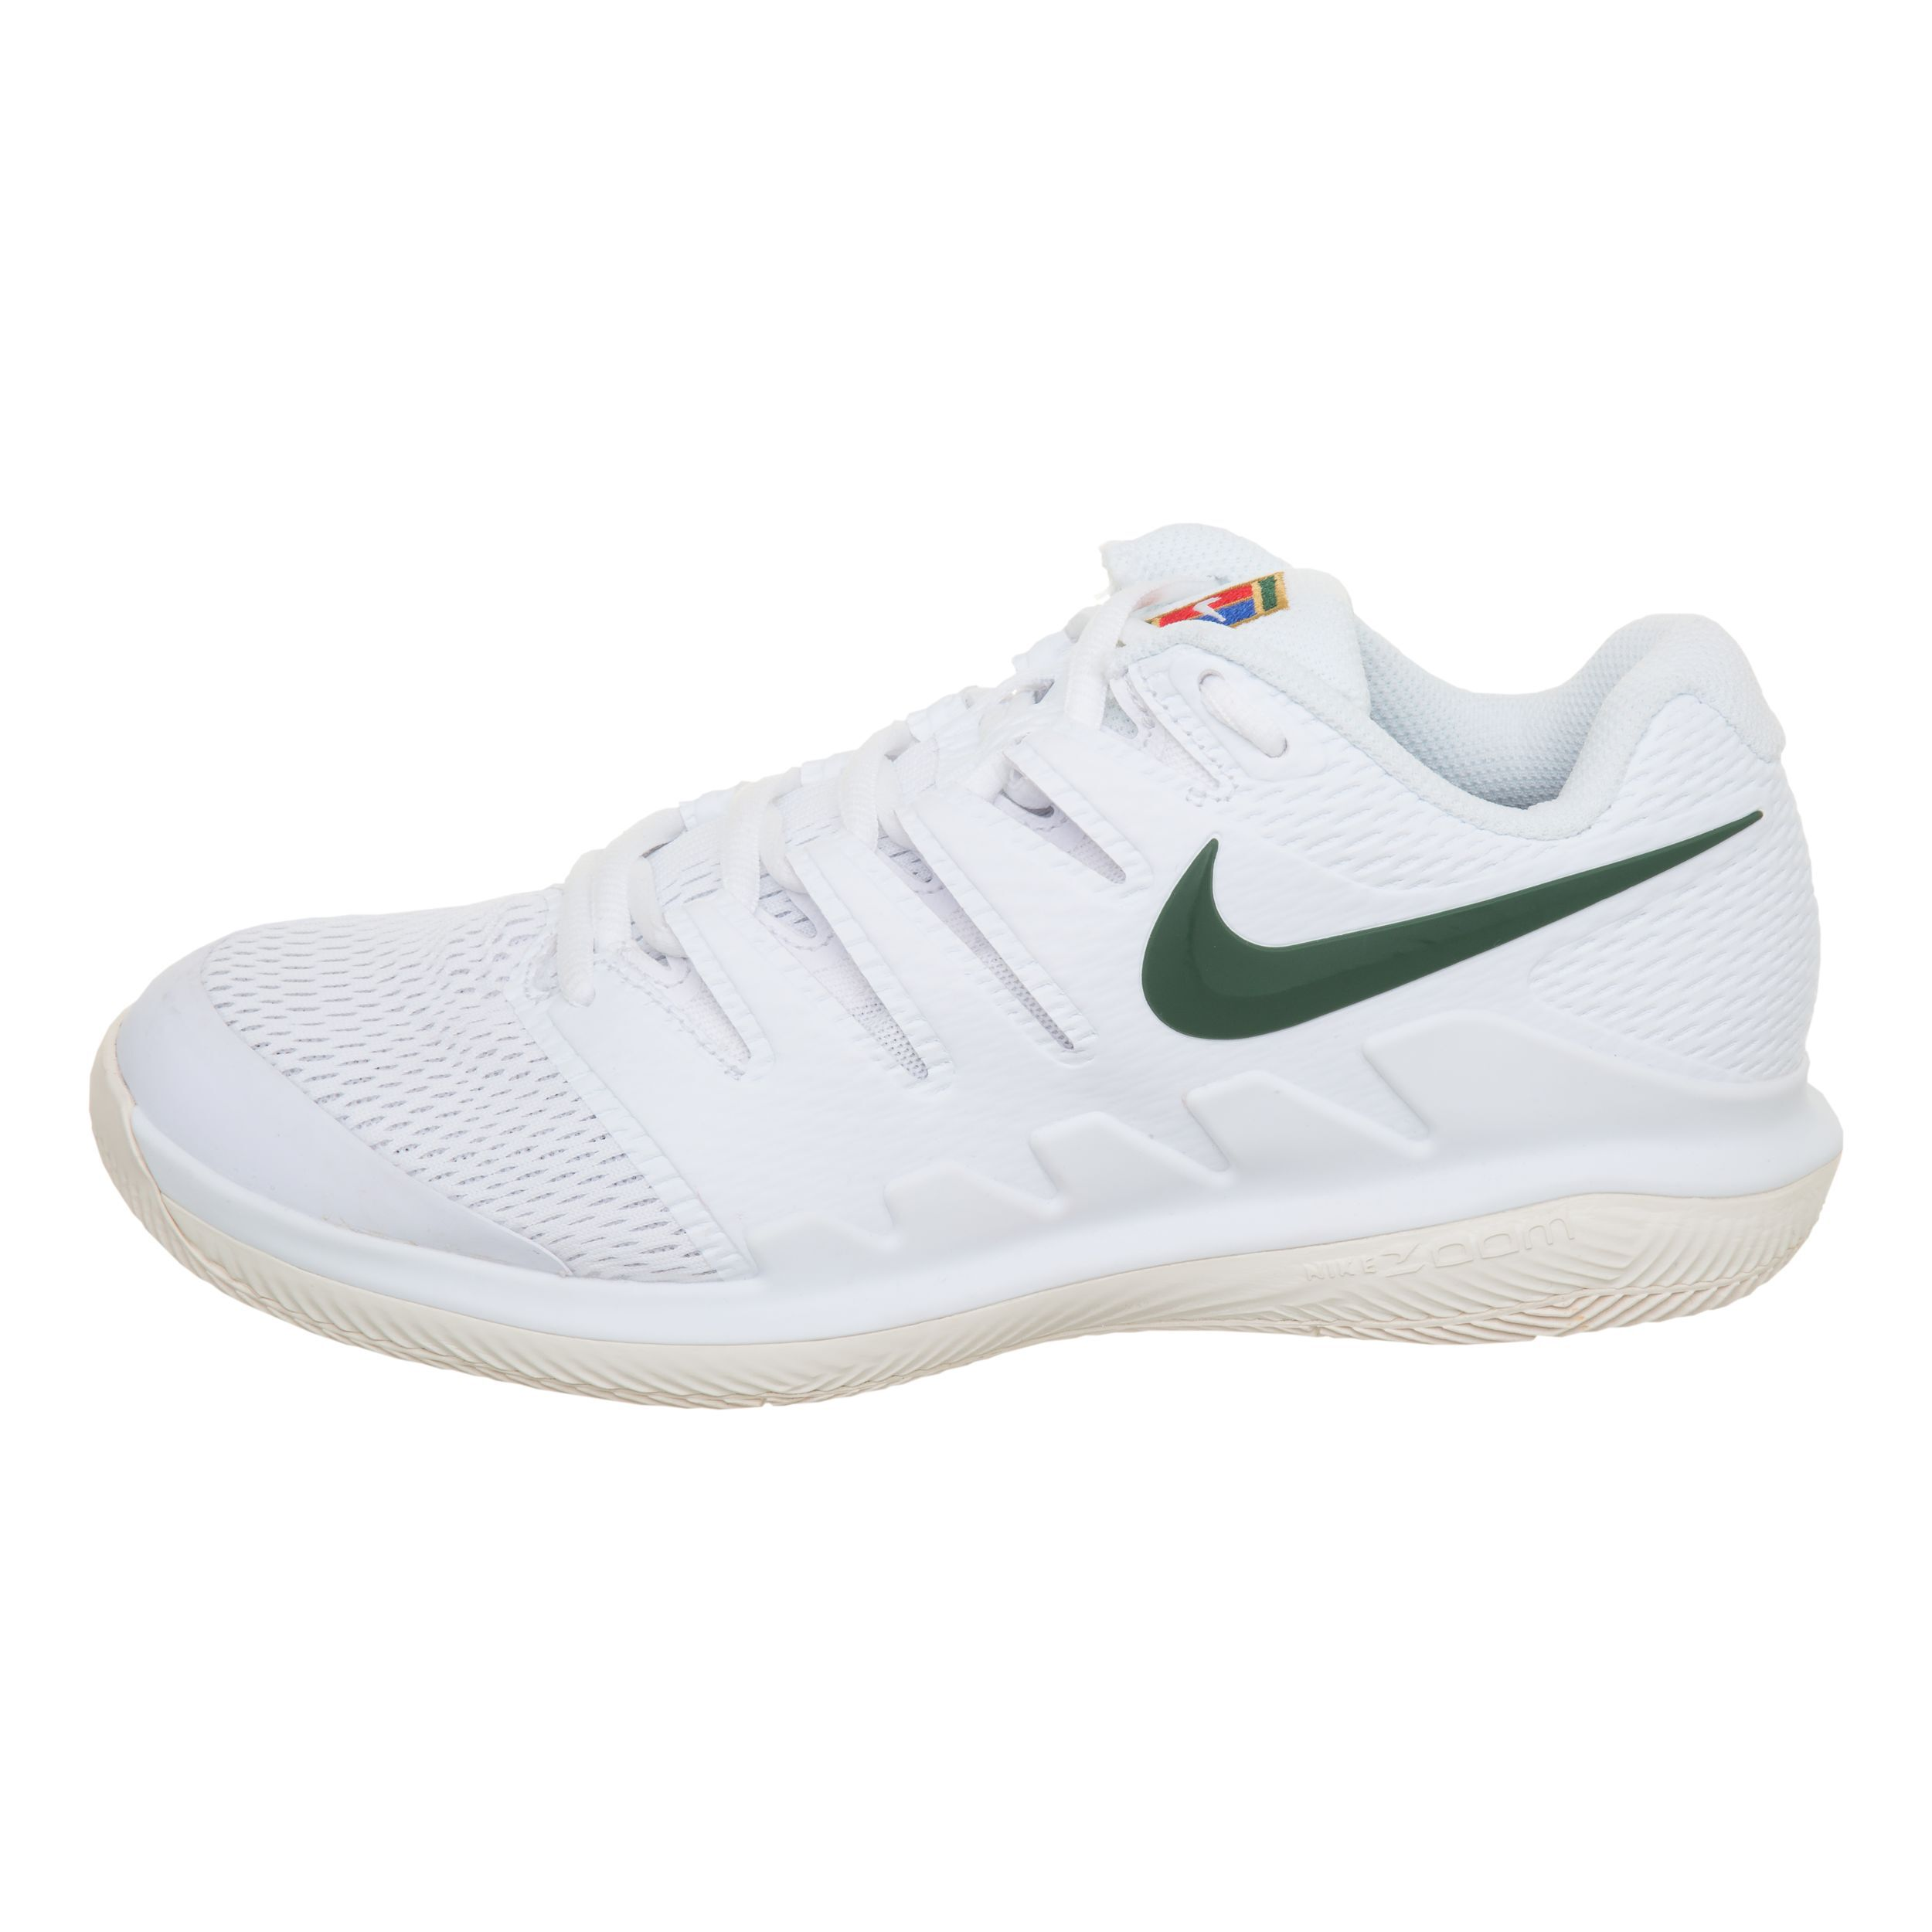 Nike Air Zoom Vapor X Chaussures Toutes Surfaces Femmes